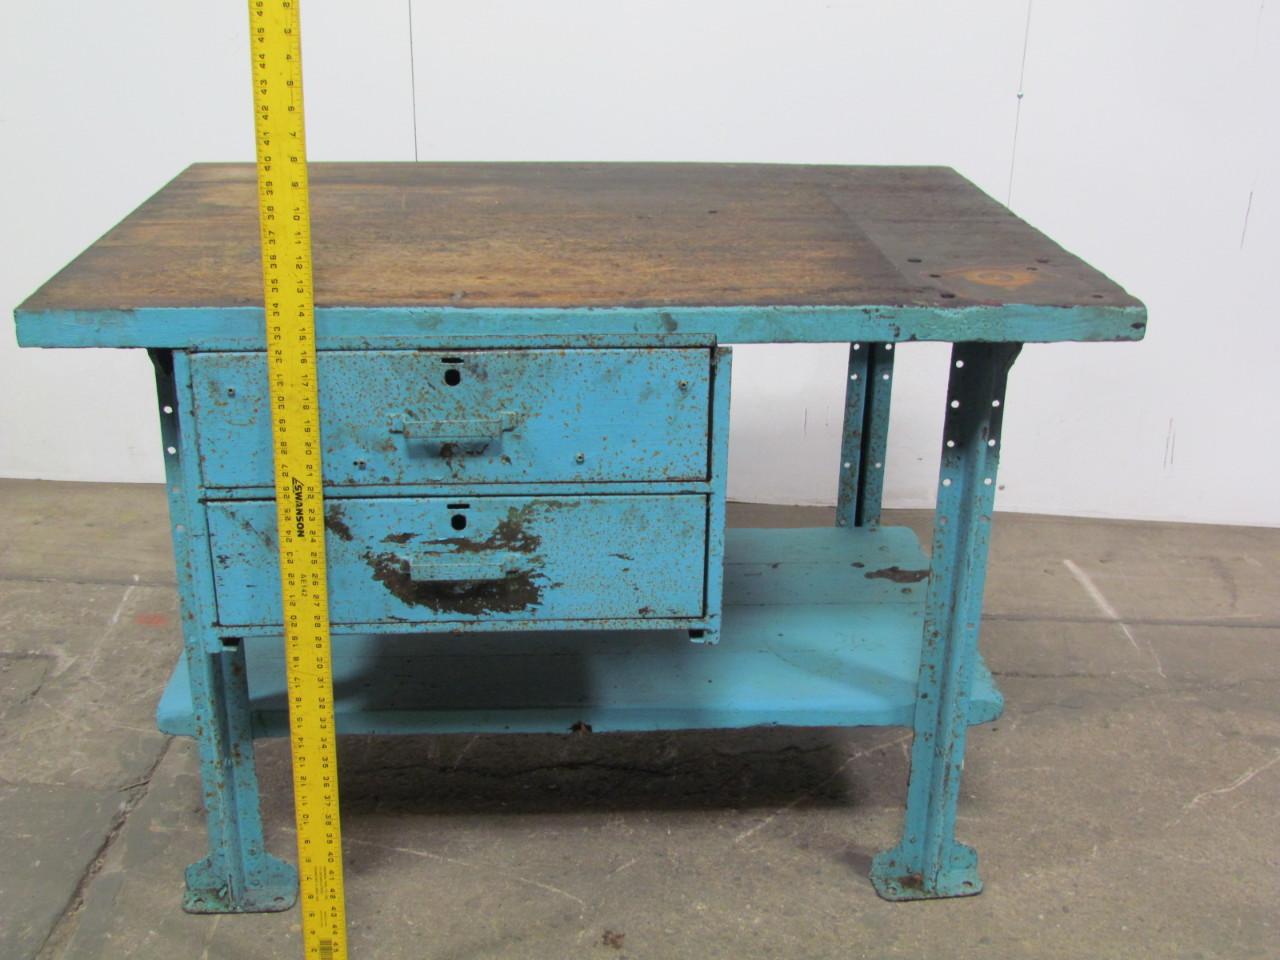 butcher block workbench industrial table kitchen island 48 butcher block workbench industrial table kitchen island 48